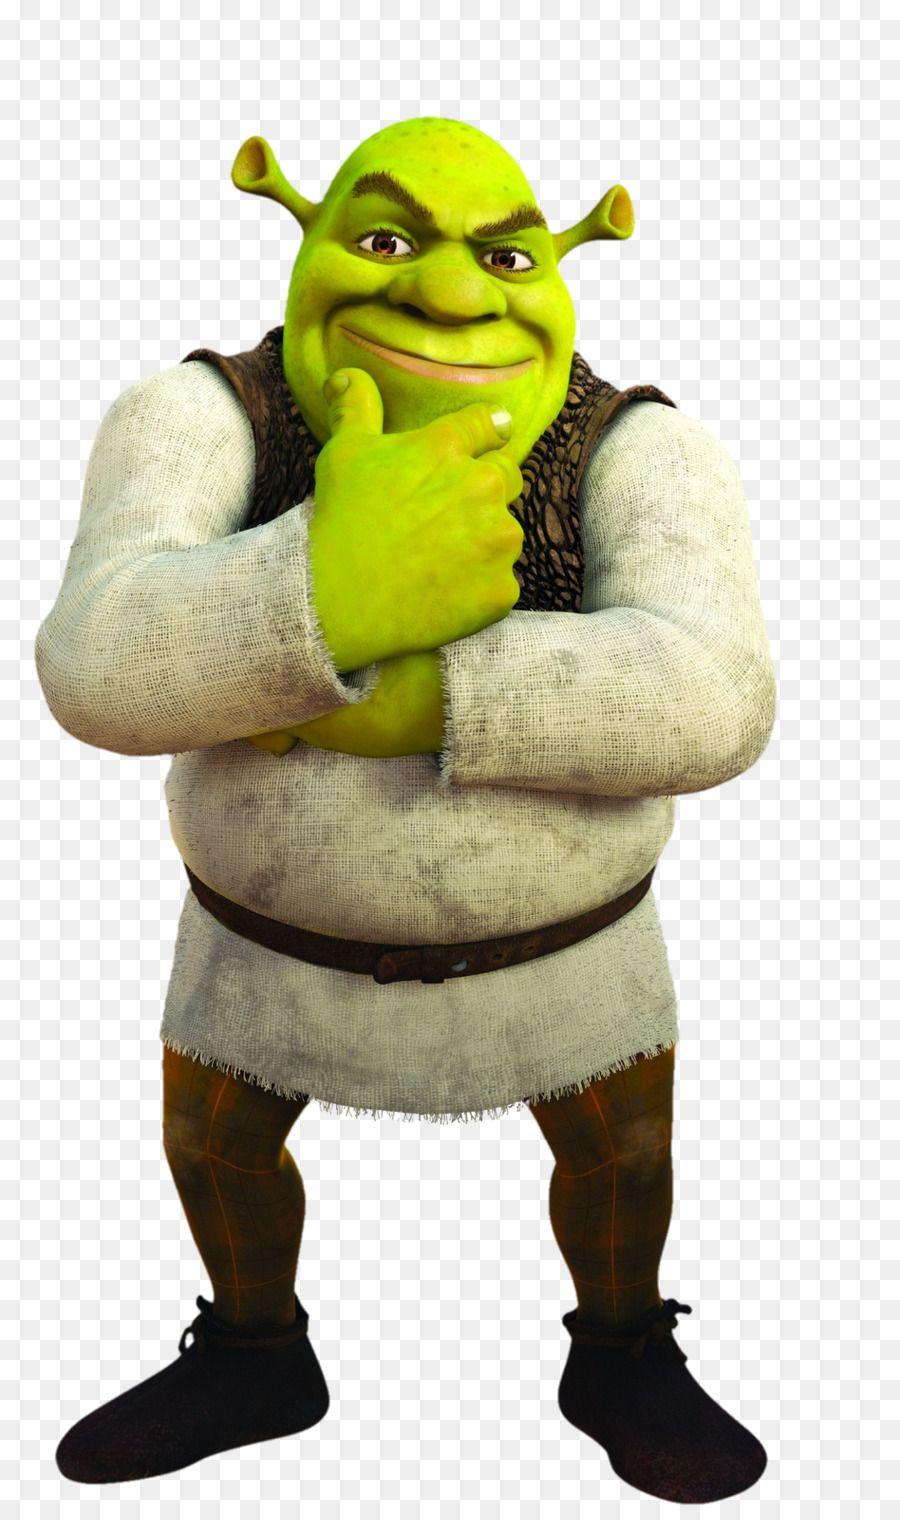 Shrek Transparent Clipart Donkey Gingerbread Man Clip Art Shrek Disney Fan Art Punk Disney Princesses